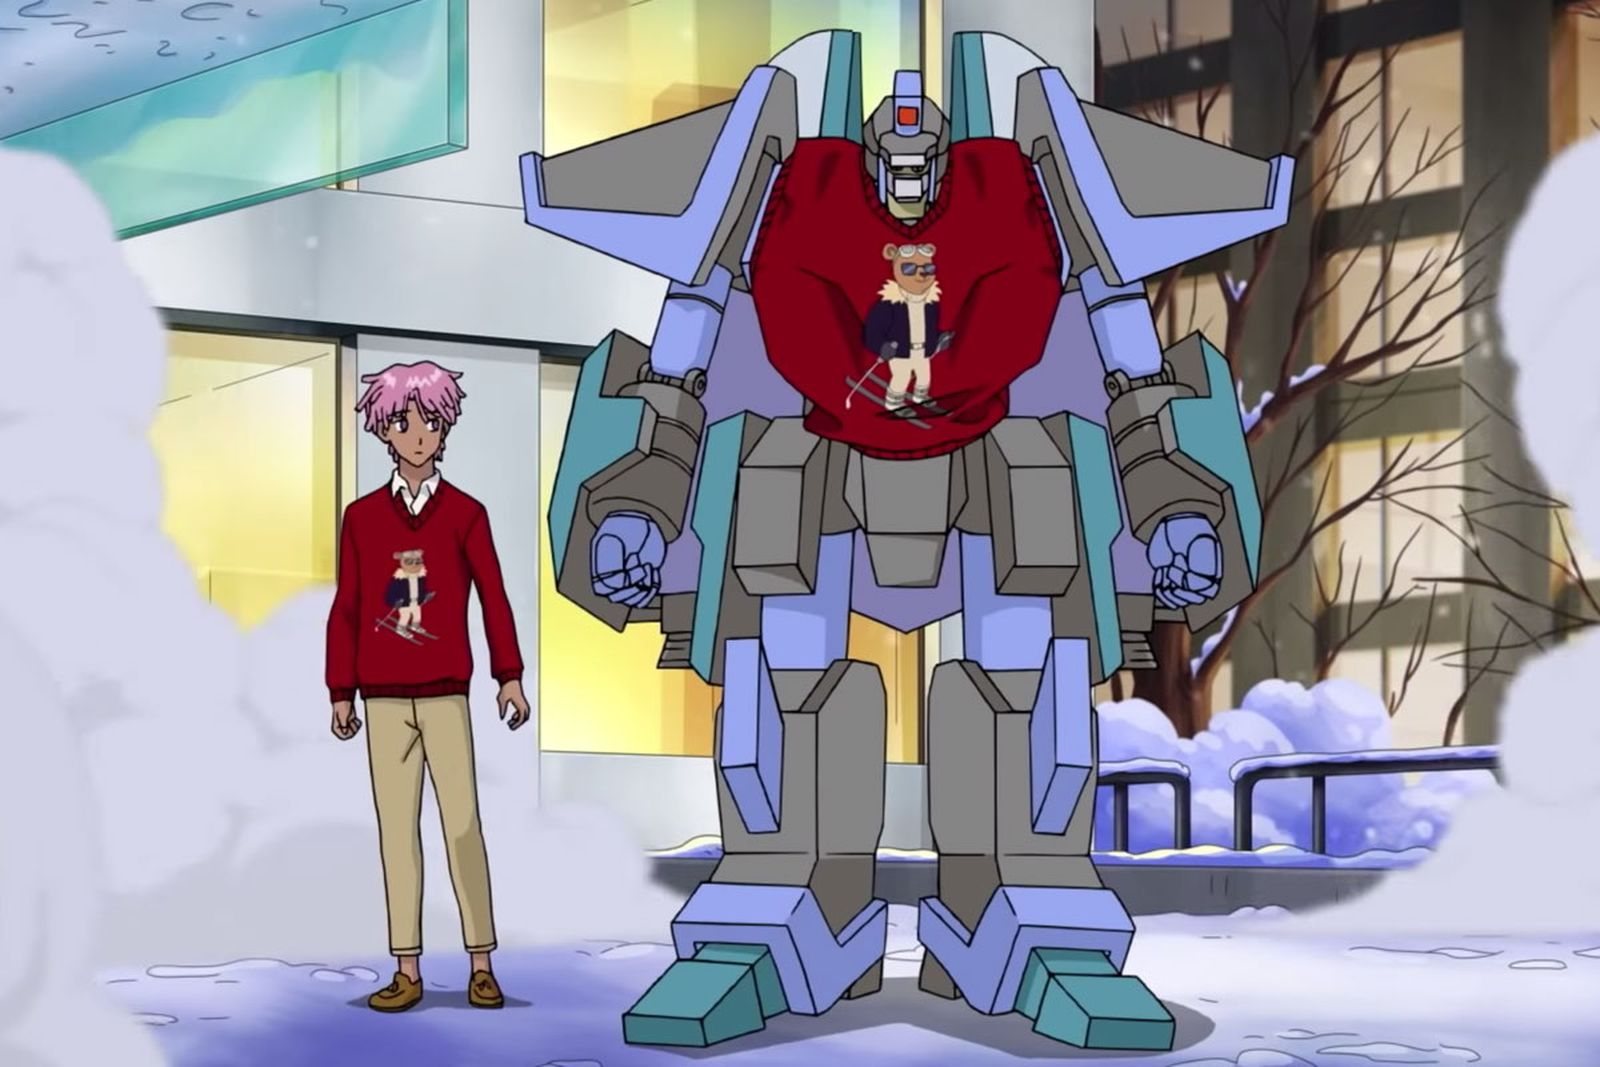 neo yokio fashion refrences lead anime jaden smith netflix